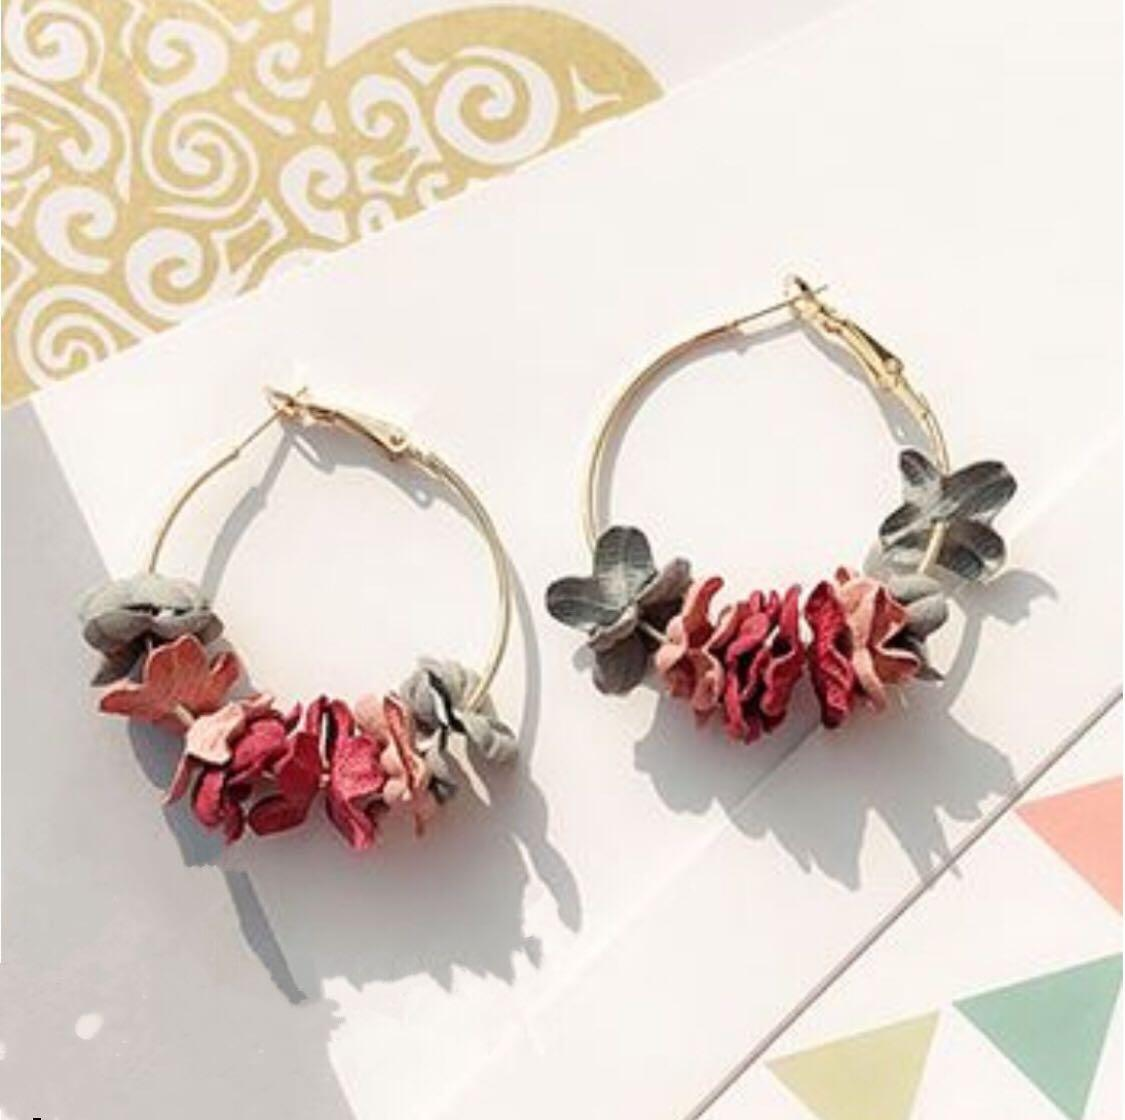 (NEW ARRIVALS) Beatrice Floral Hoop Earrings